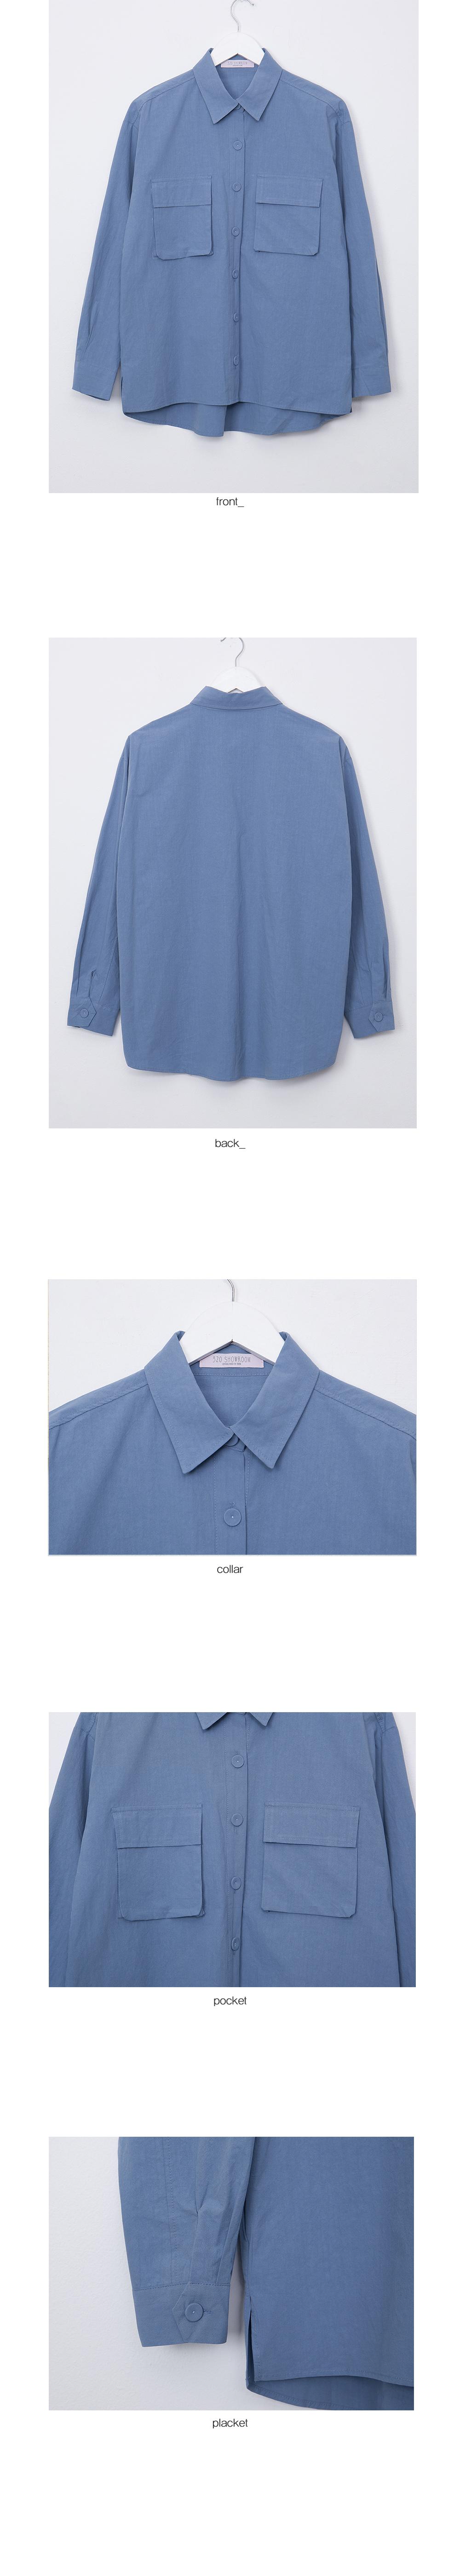 pocket-washing-blue_03.jpg